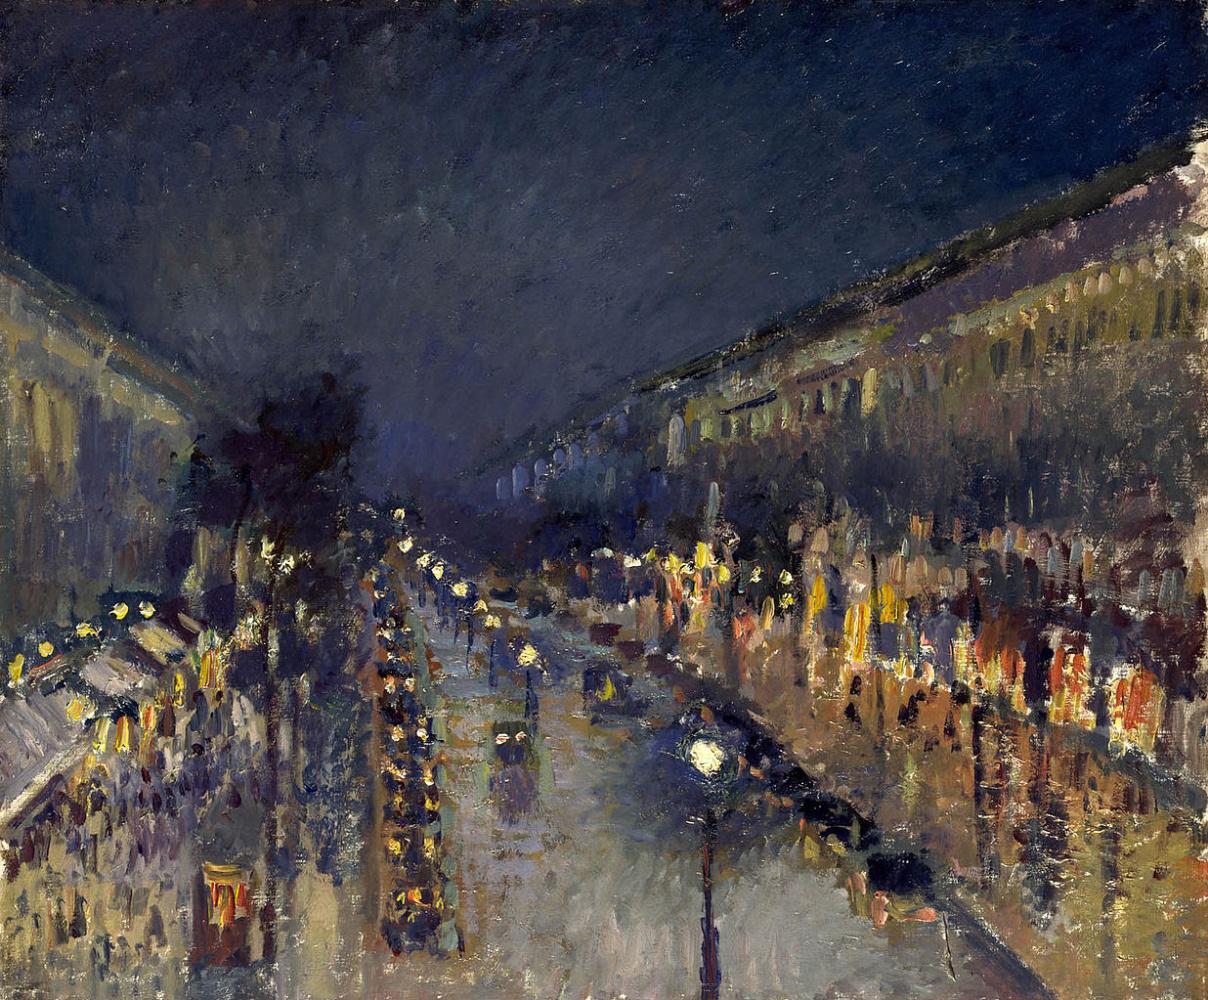 Camille Pissarro. Boulevard Montmartre by night